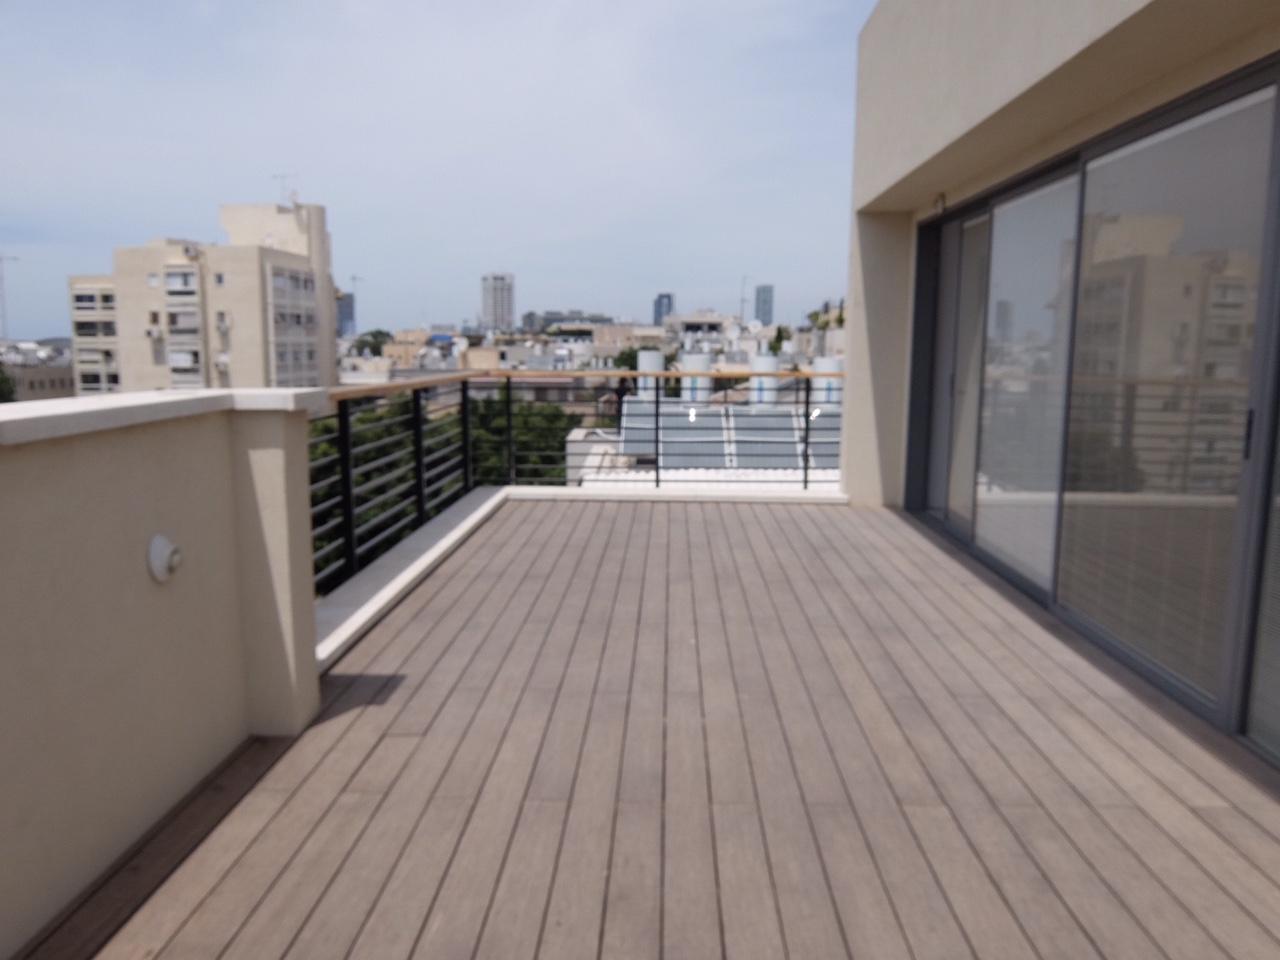 Habima area: Huge duplex with 4 bedrooms and 3 parkings